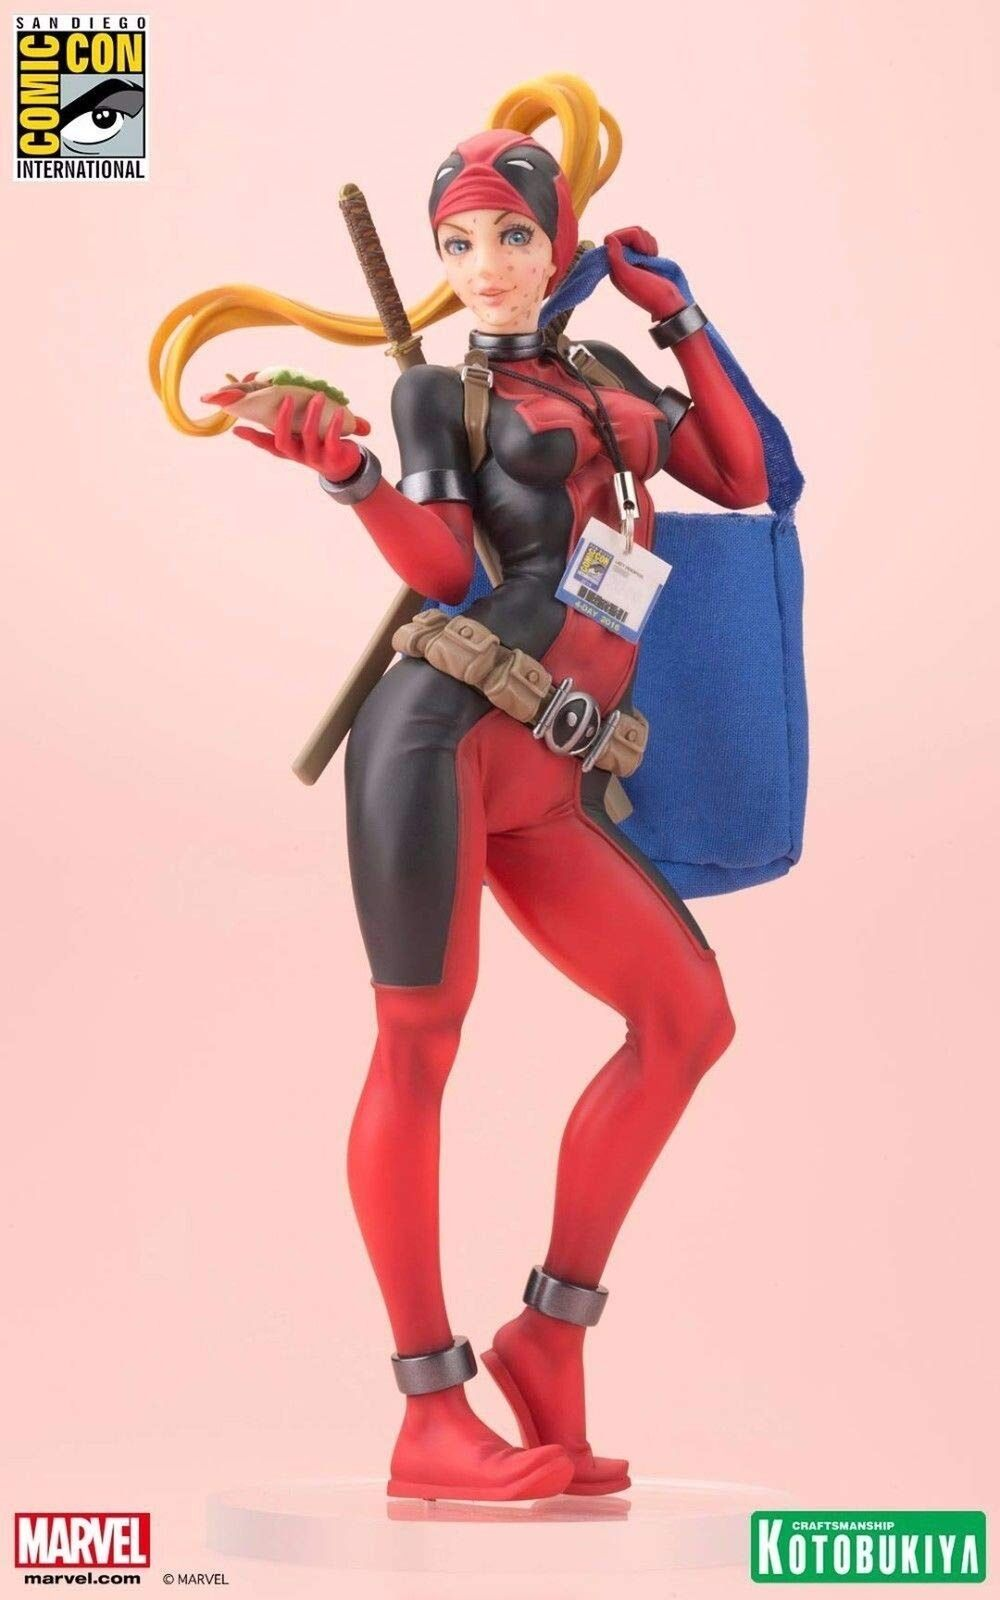 Exklusive kotobukiya marvel bishoujo sdcc 2016 lady fr deadpool statue